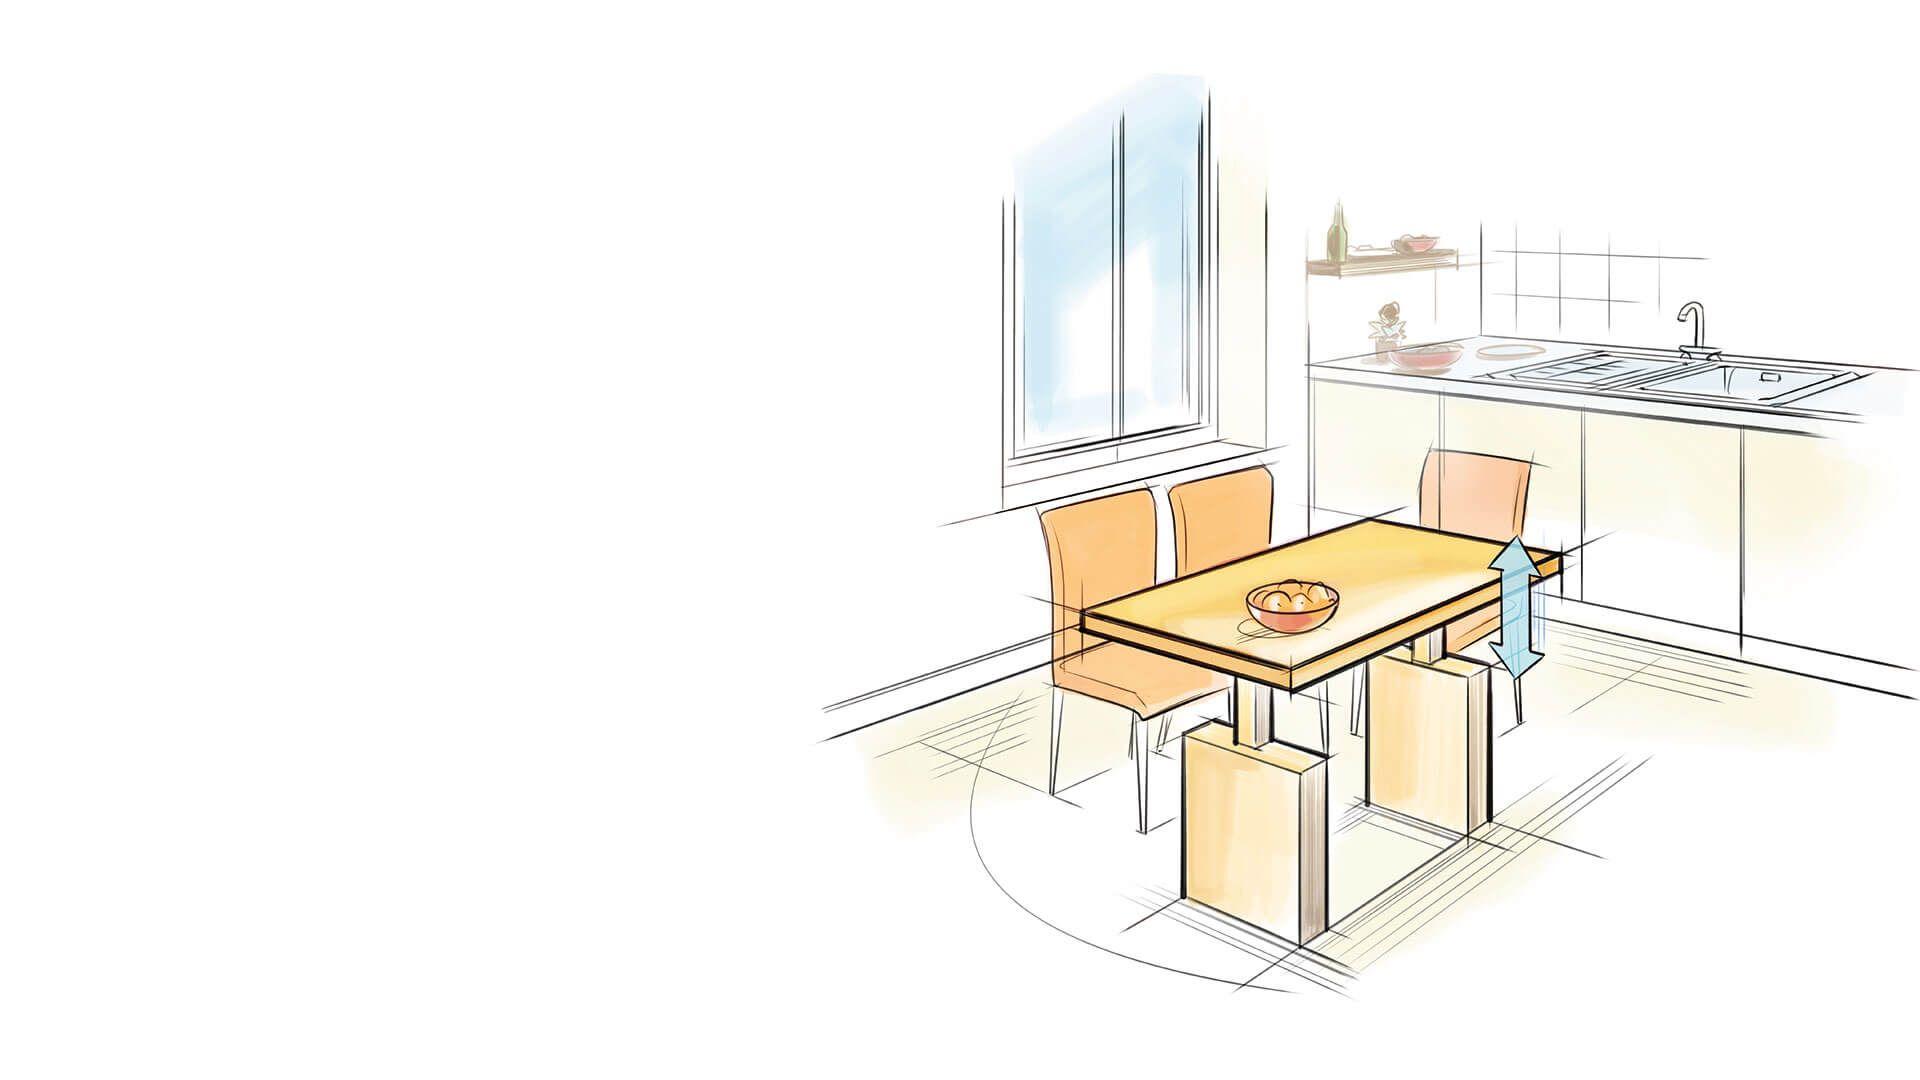 Hohenverstellbare Kuchentische Ergoagent Home Decor Home Decor